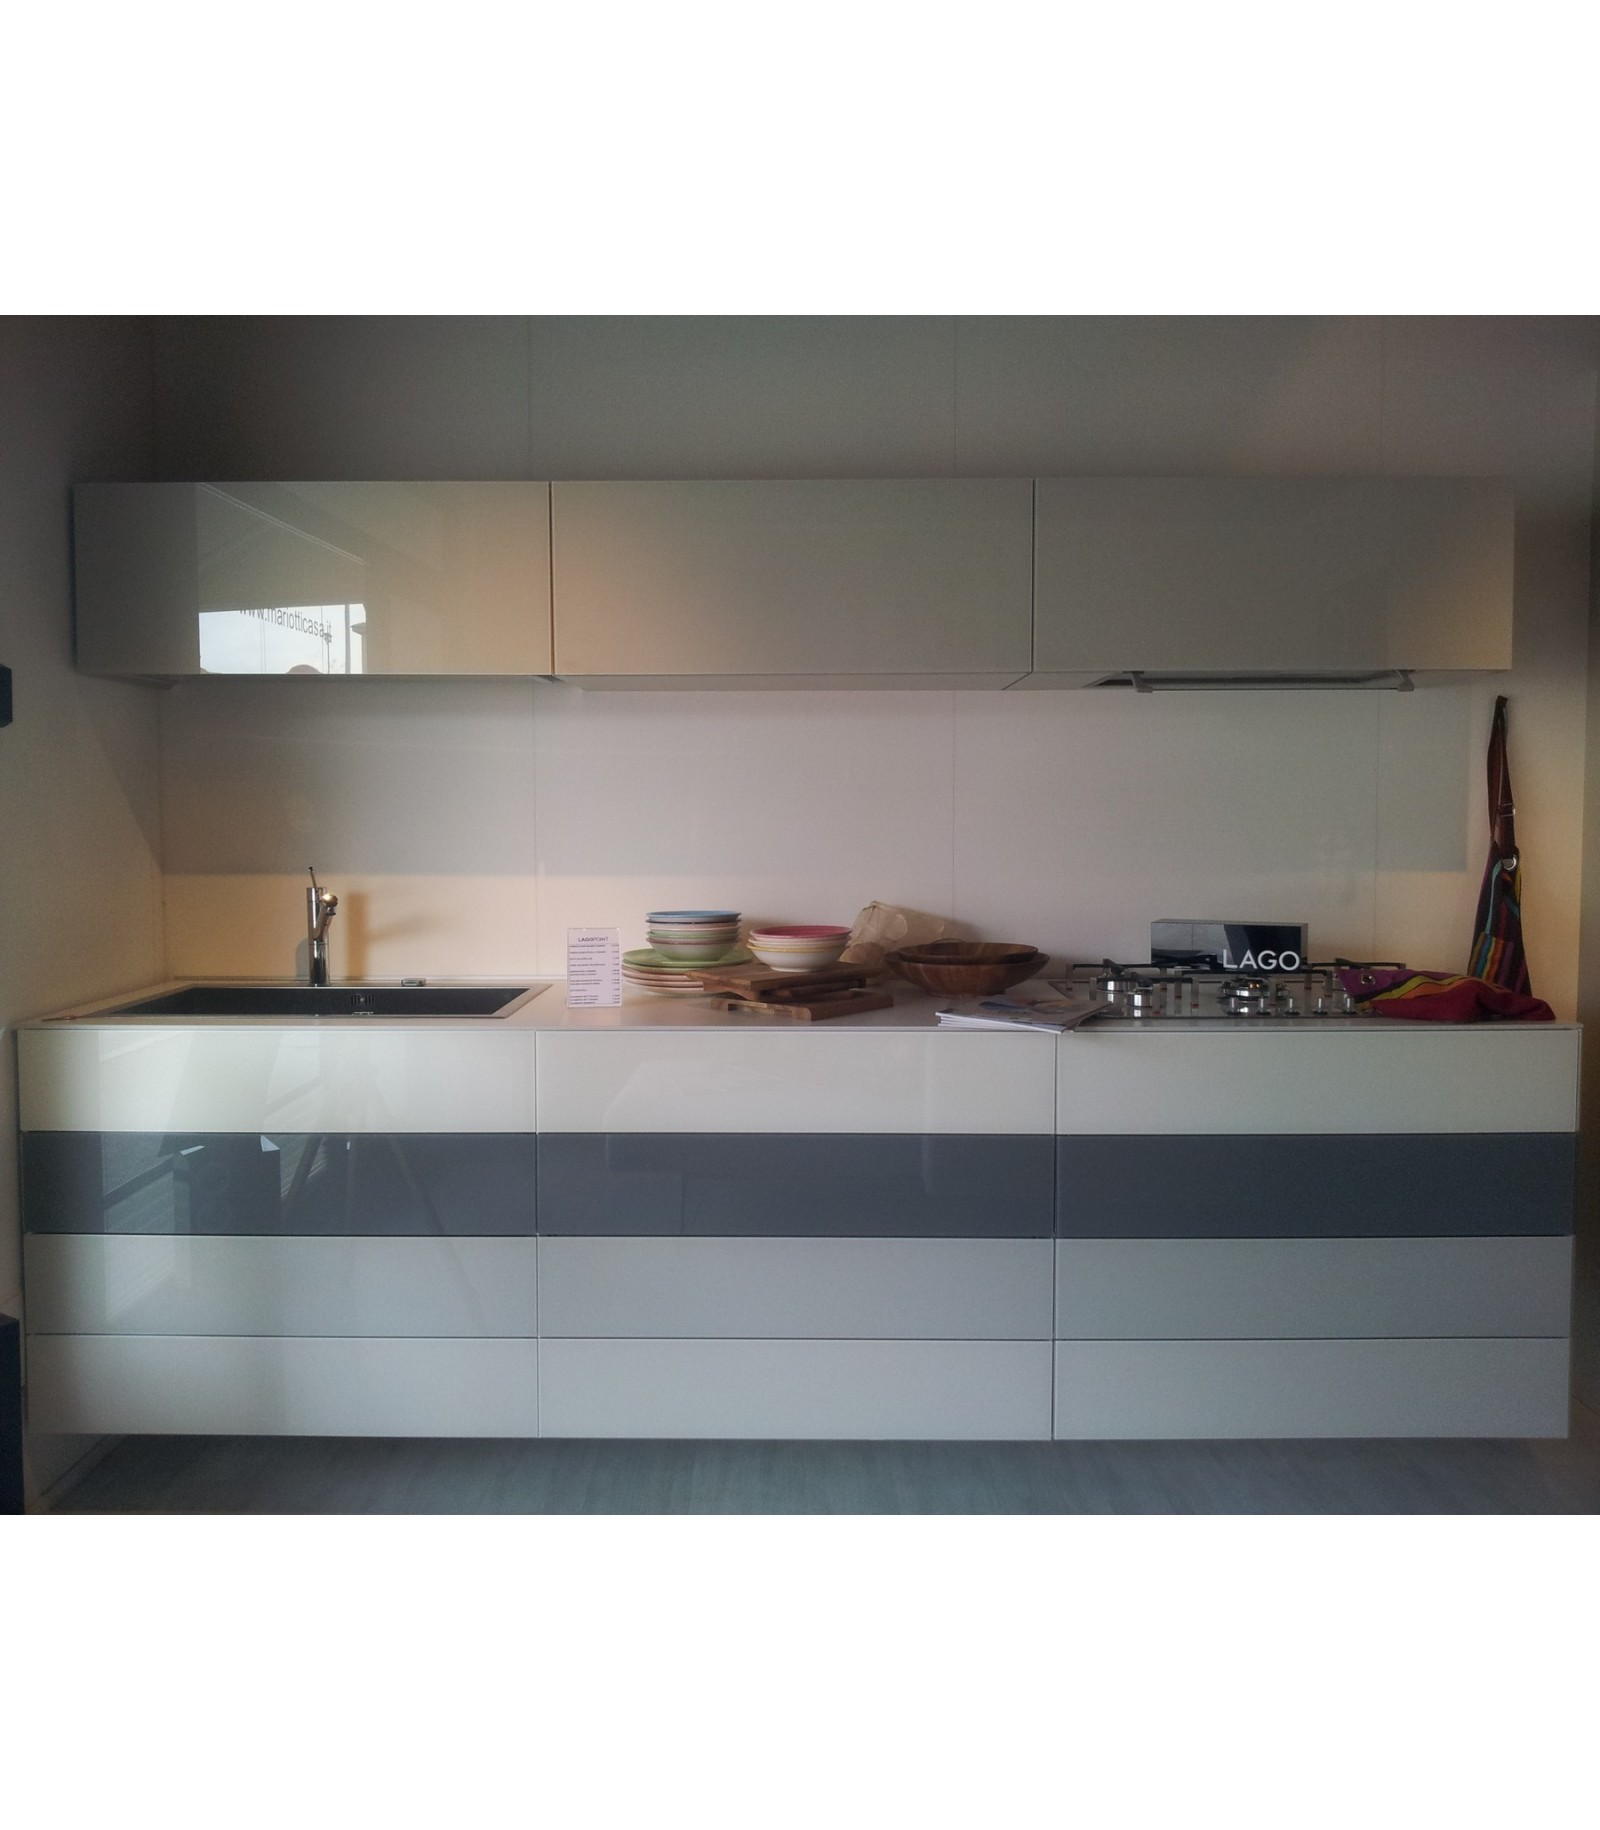 Cucina lago 36e8 mariotti casa for Lago 36e8 catalogo pdf